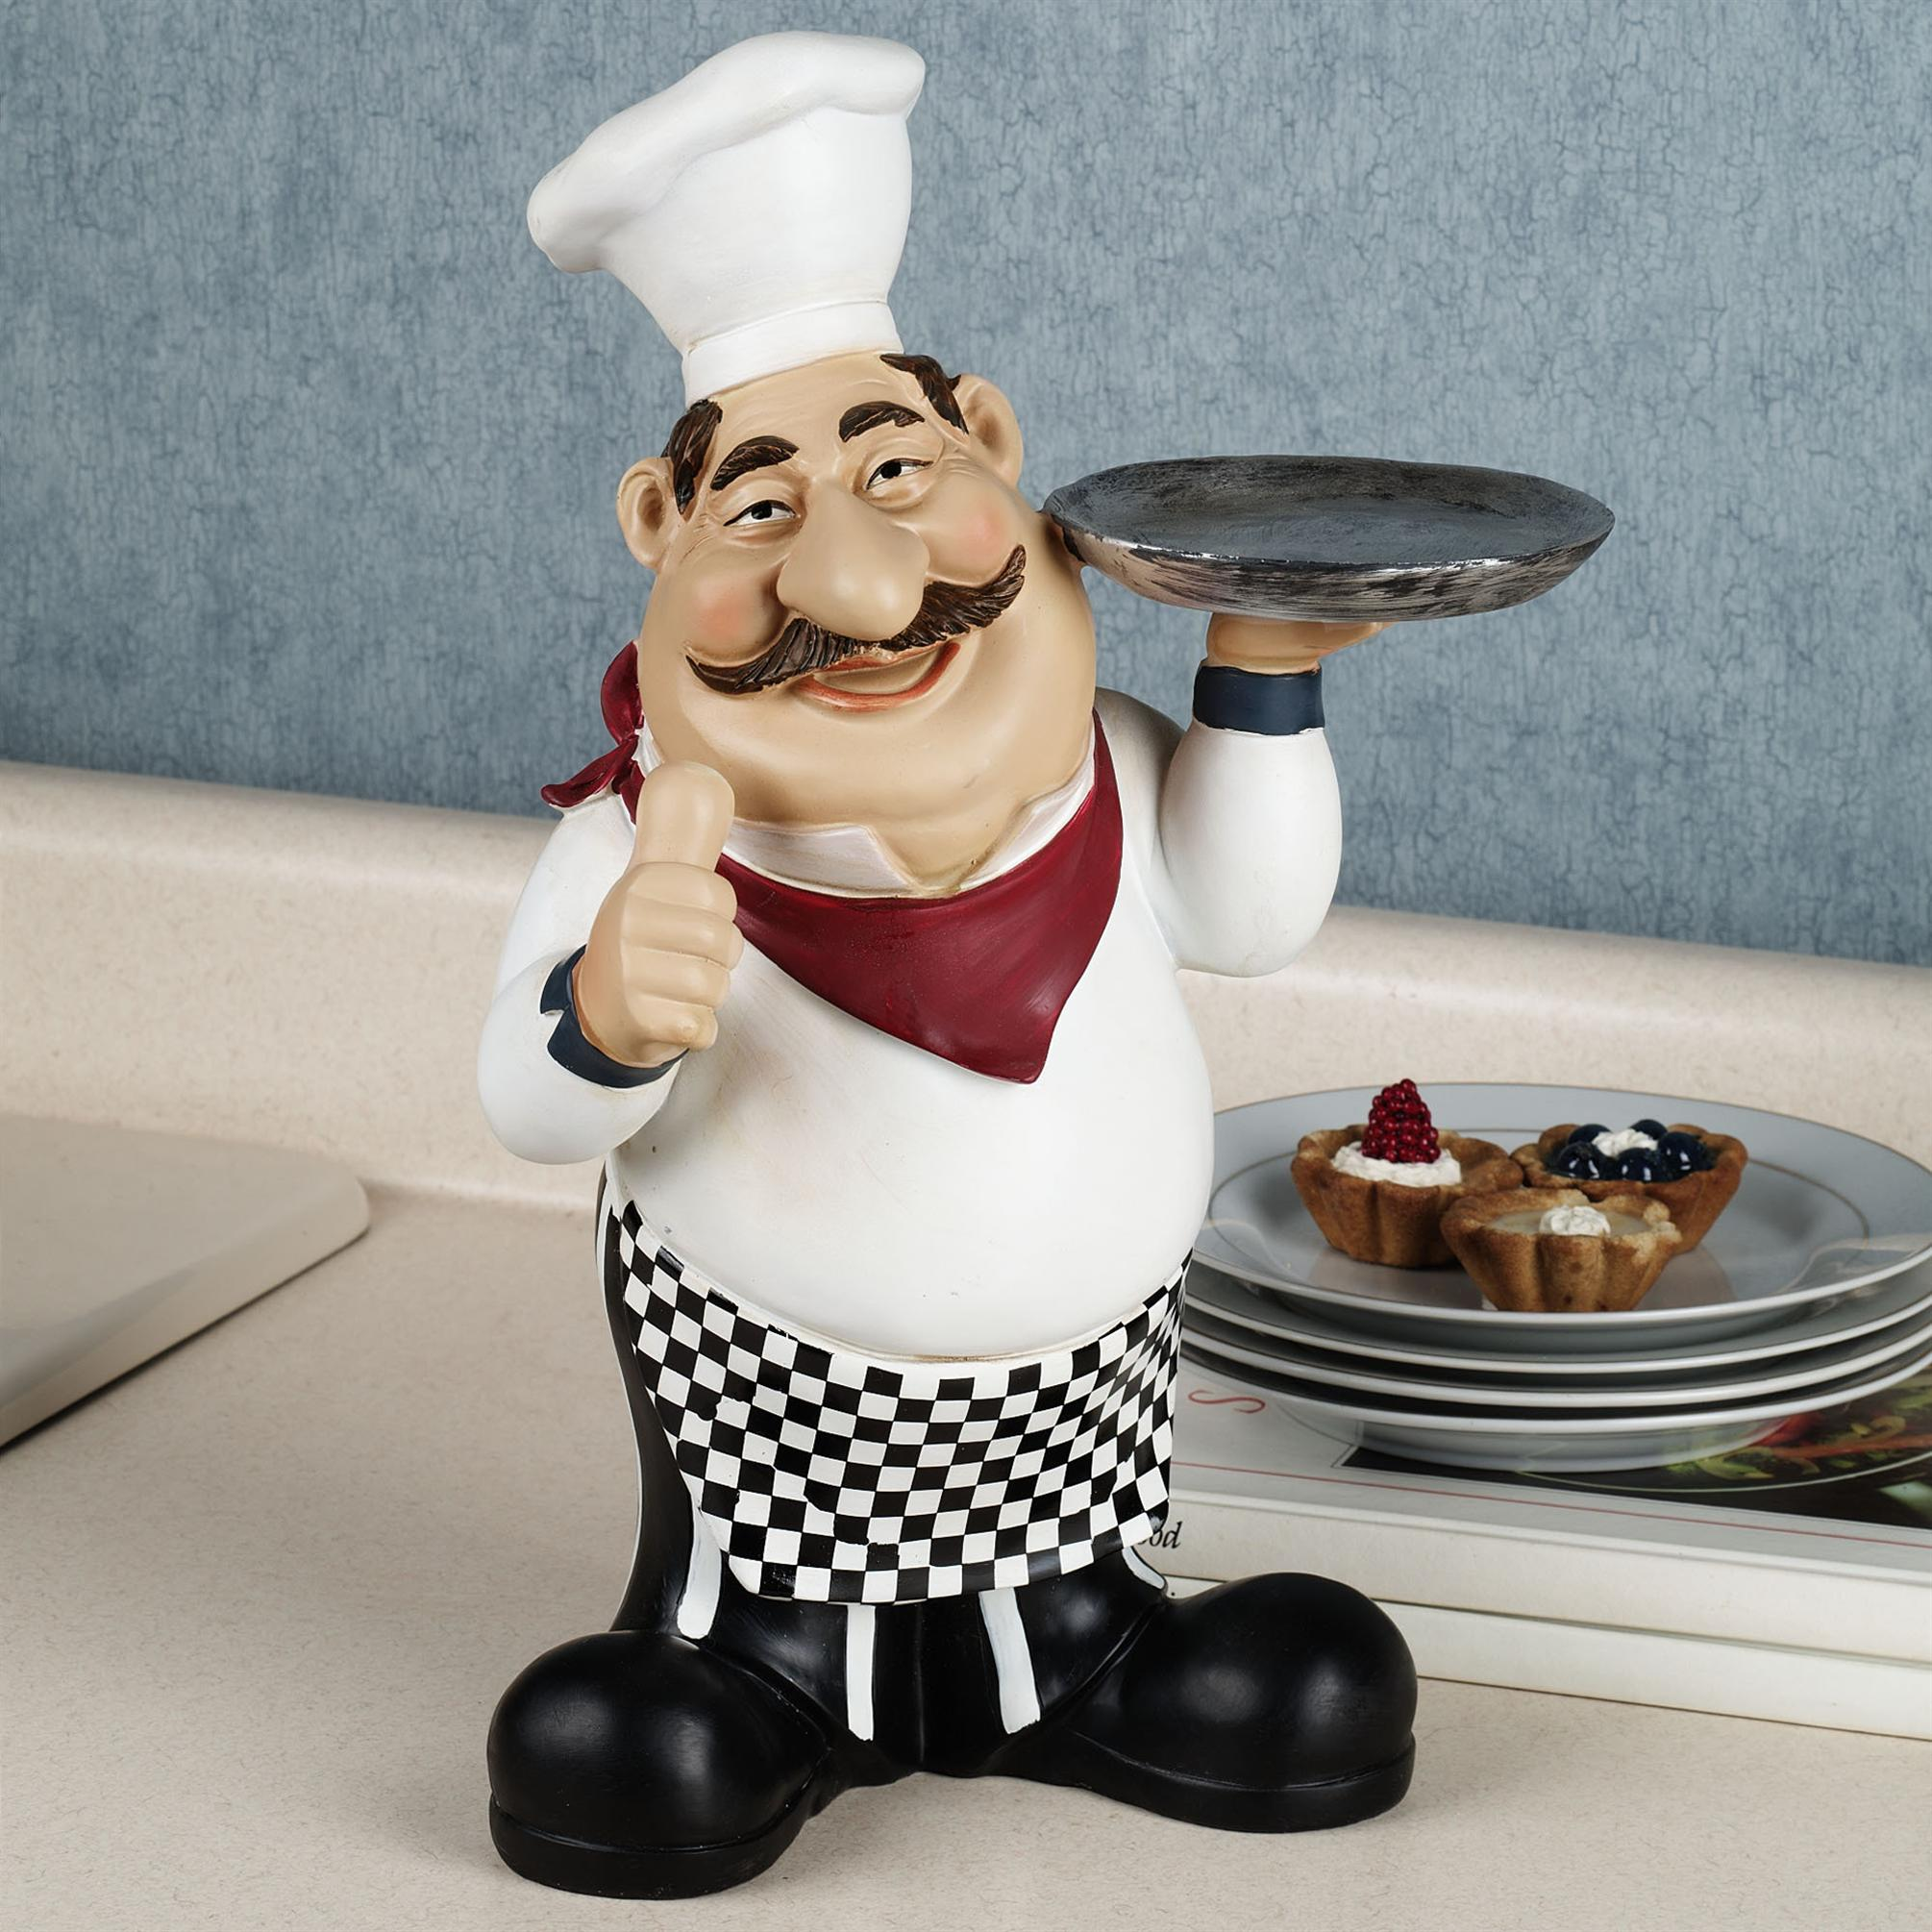 Fat Chef Kitchen Decor Image 6 Of 11